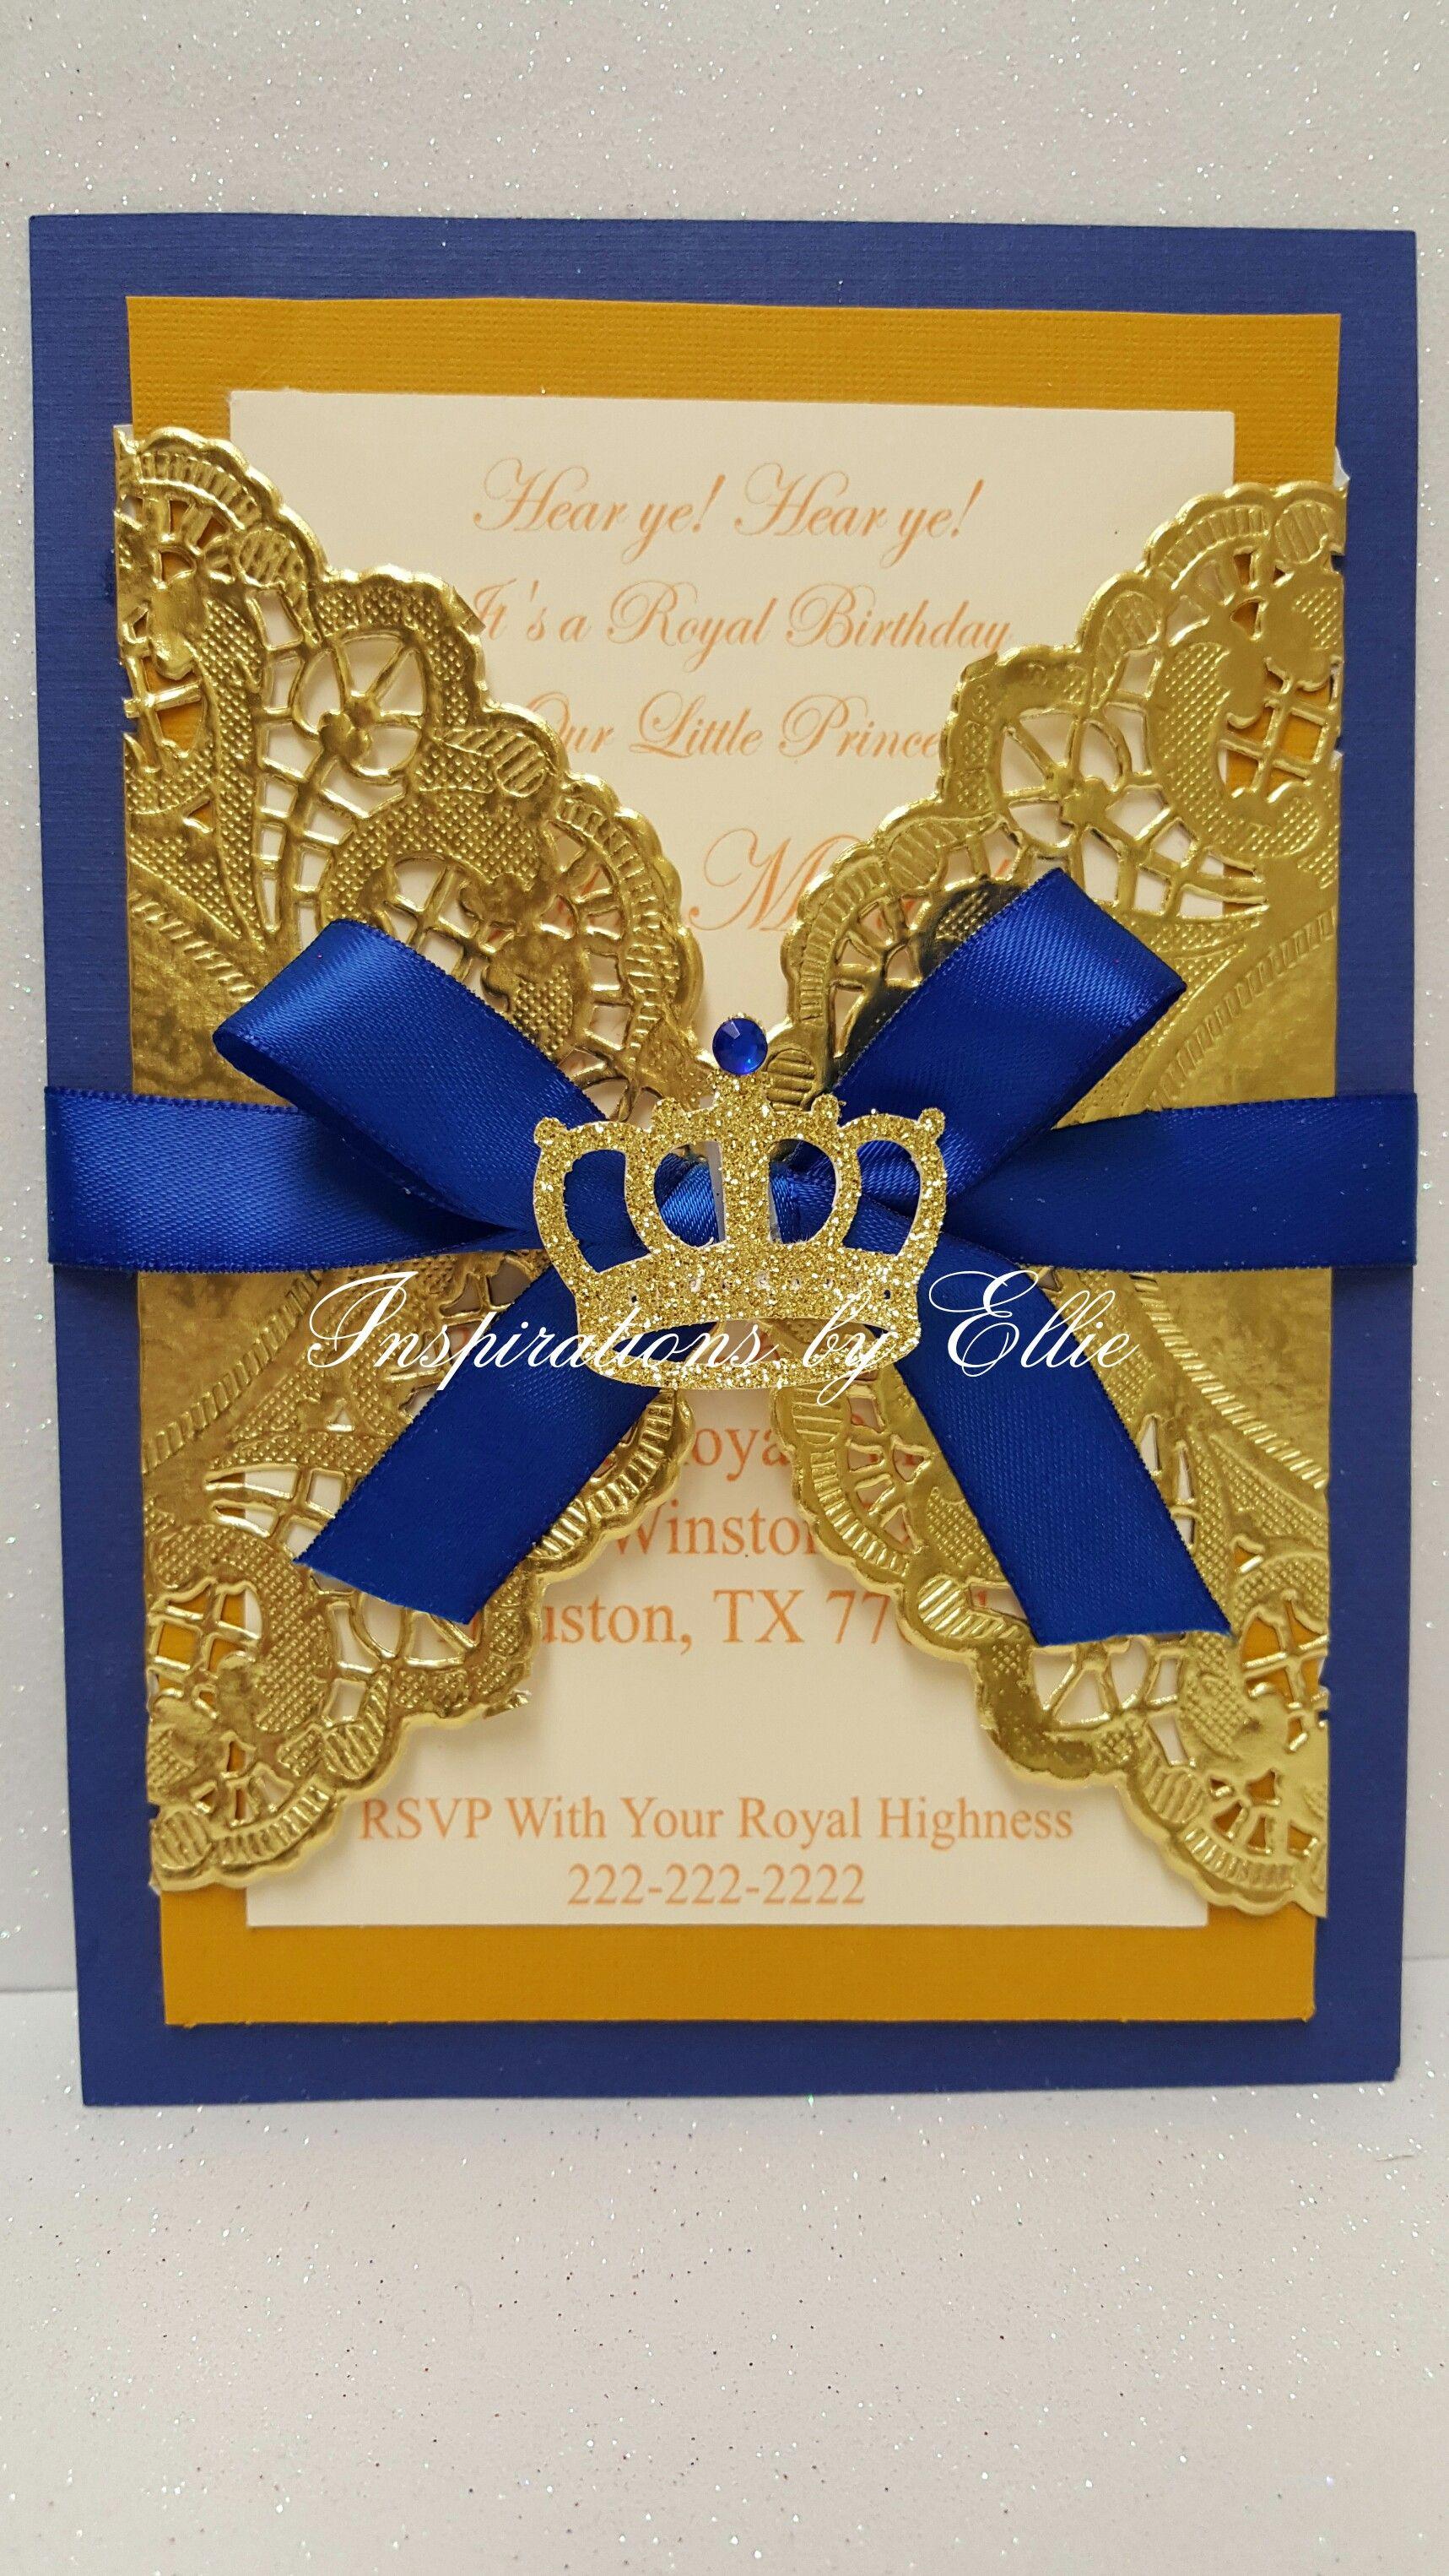 Royal Prince Birthday Invitations Set of 12